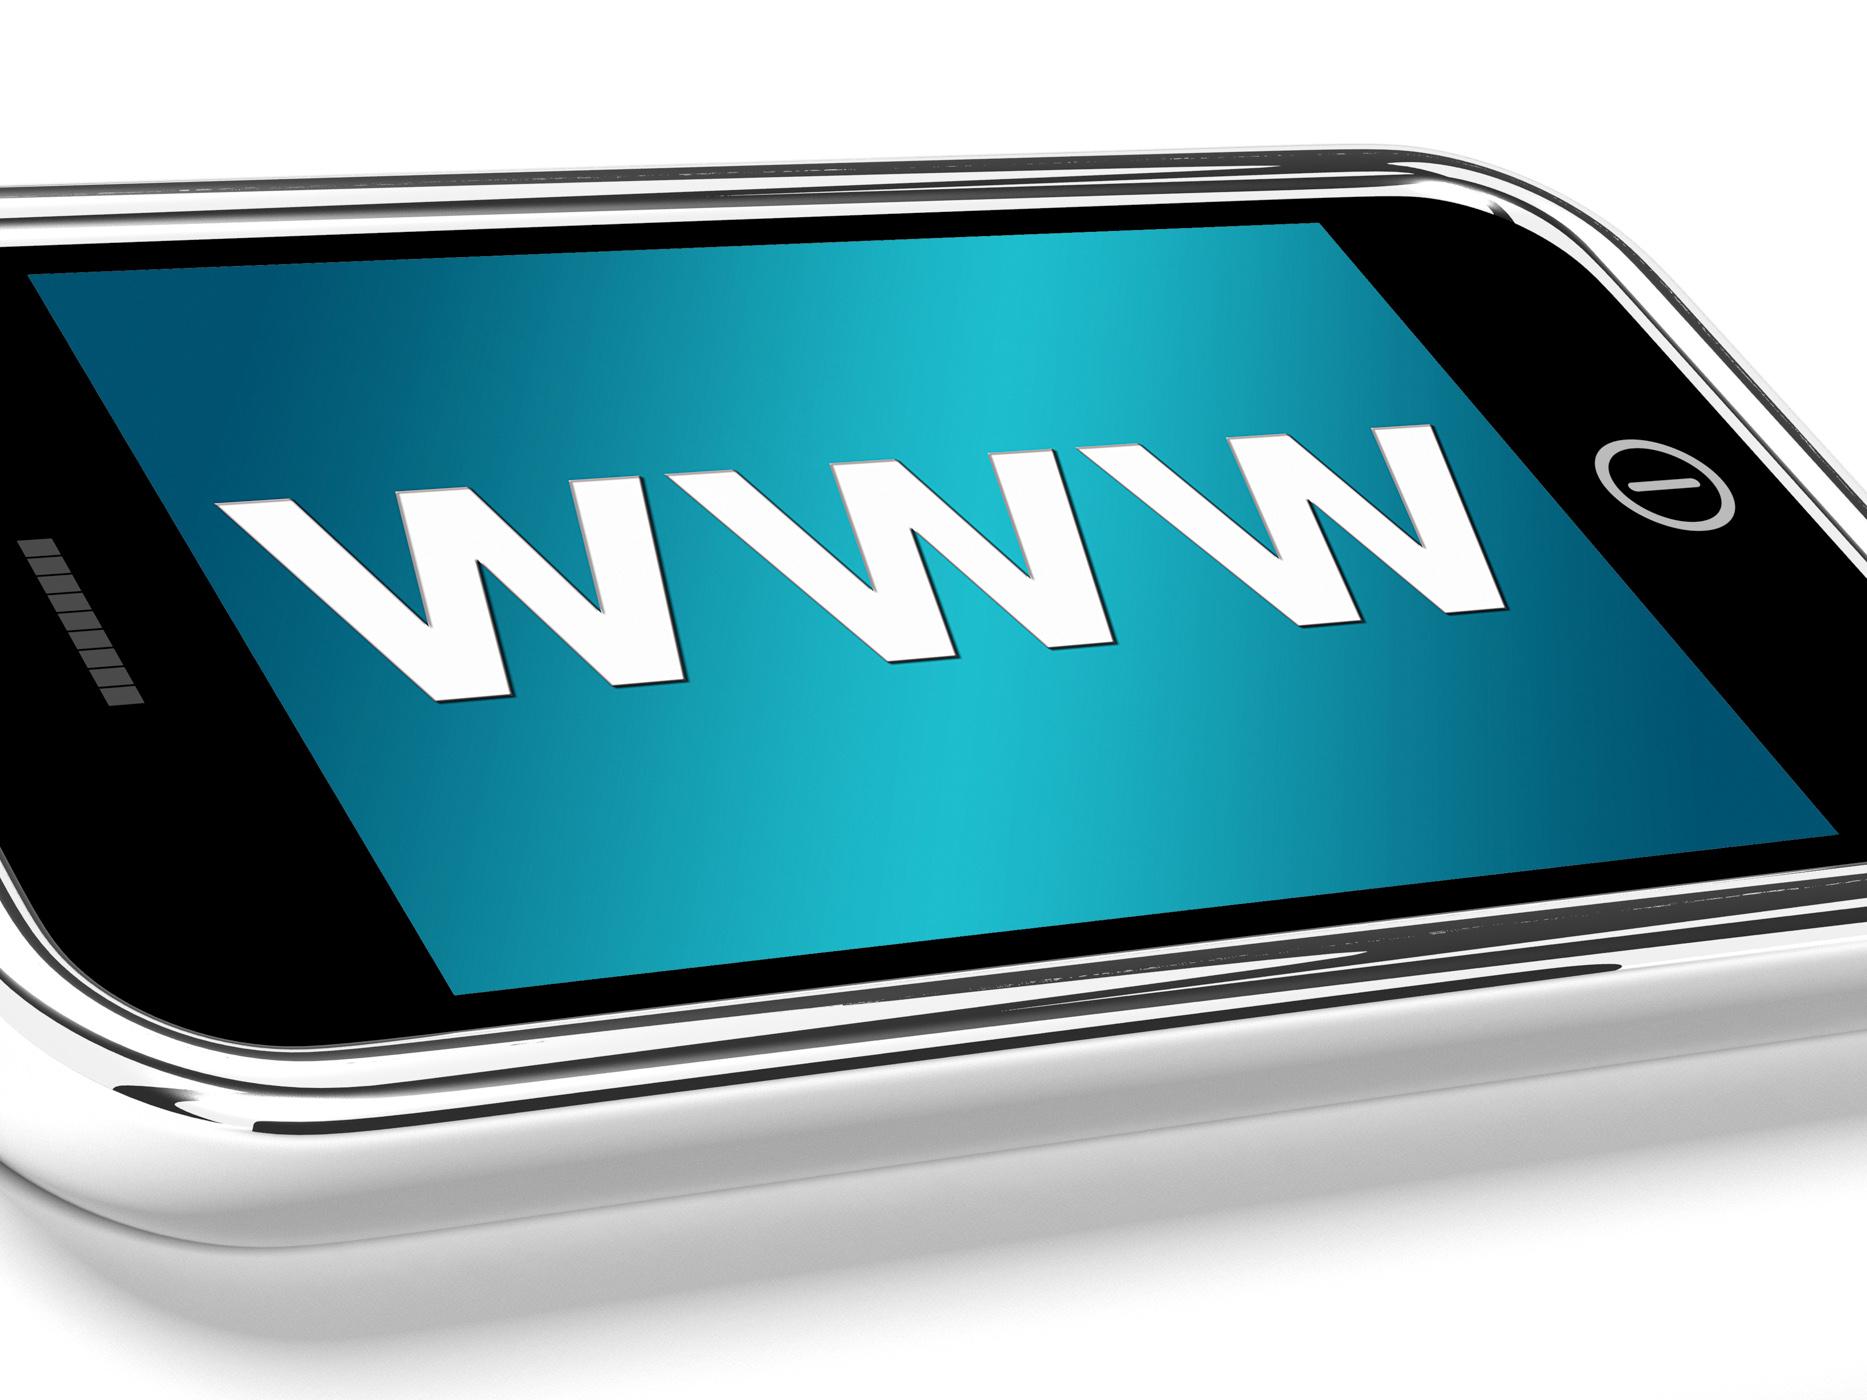 Www shows online websites or mobile internet photo